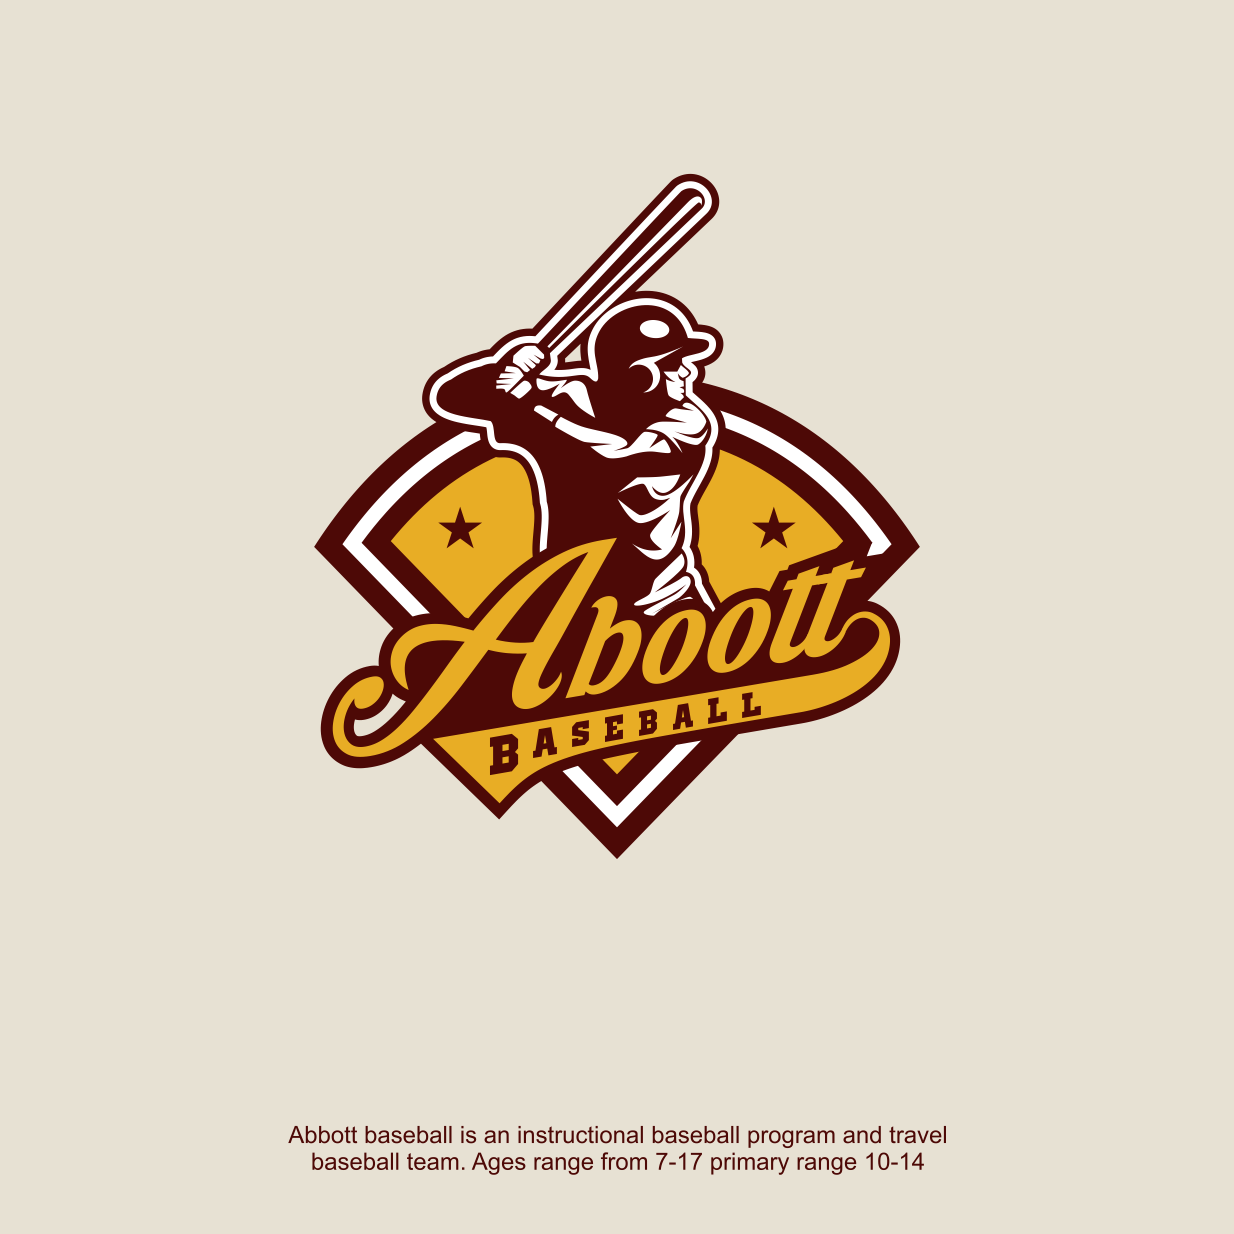 Vintage Baseball Logo 6579 Personal Design In 2020 Baseball Design Vintage Baseball Sports Logo Design